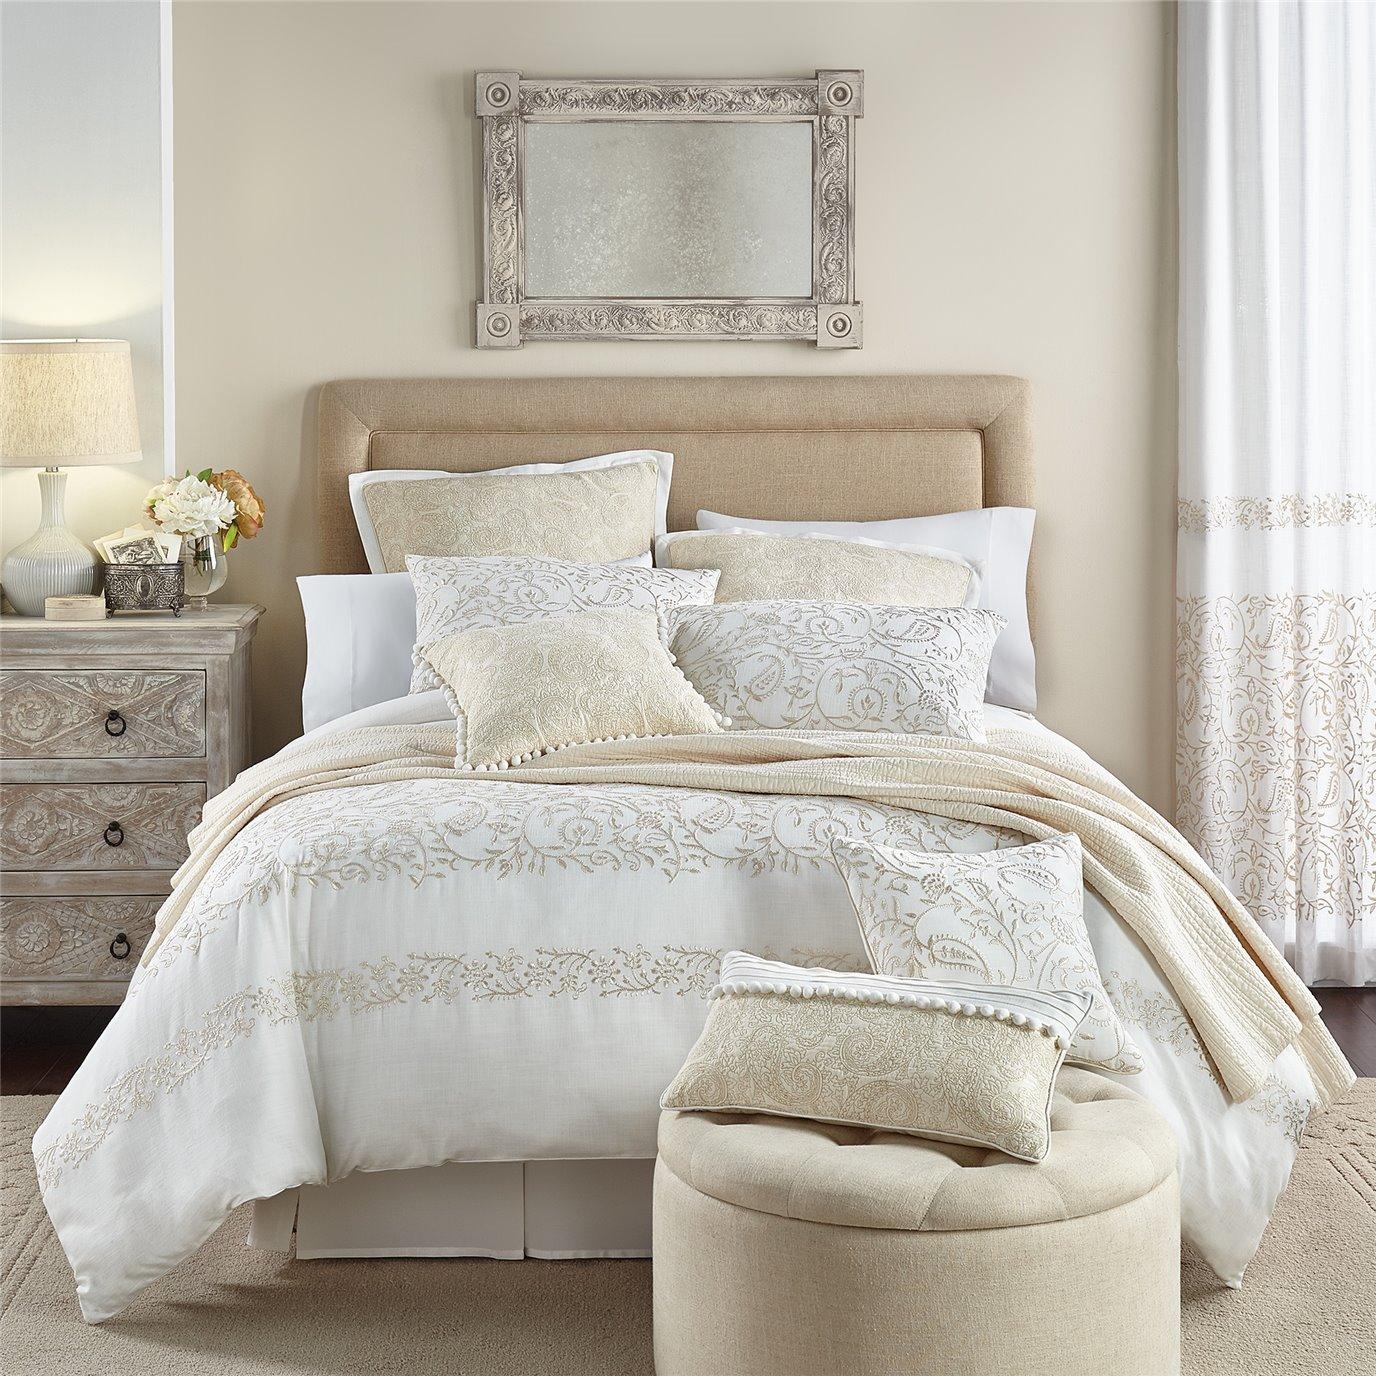 Croscill Cela Cal King 4PC Comforter Set